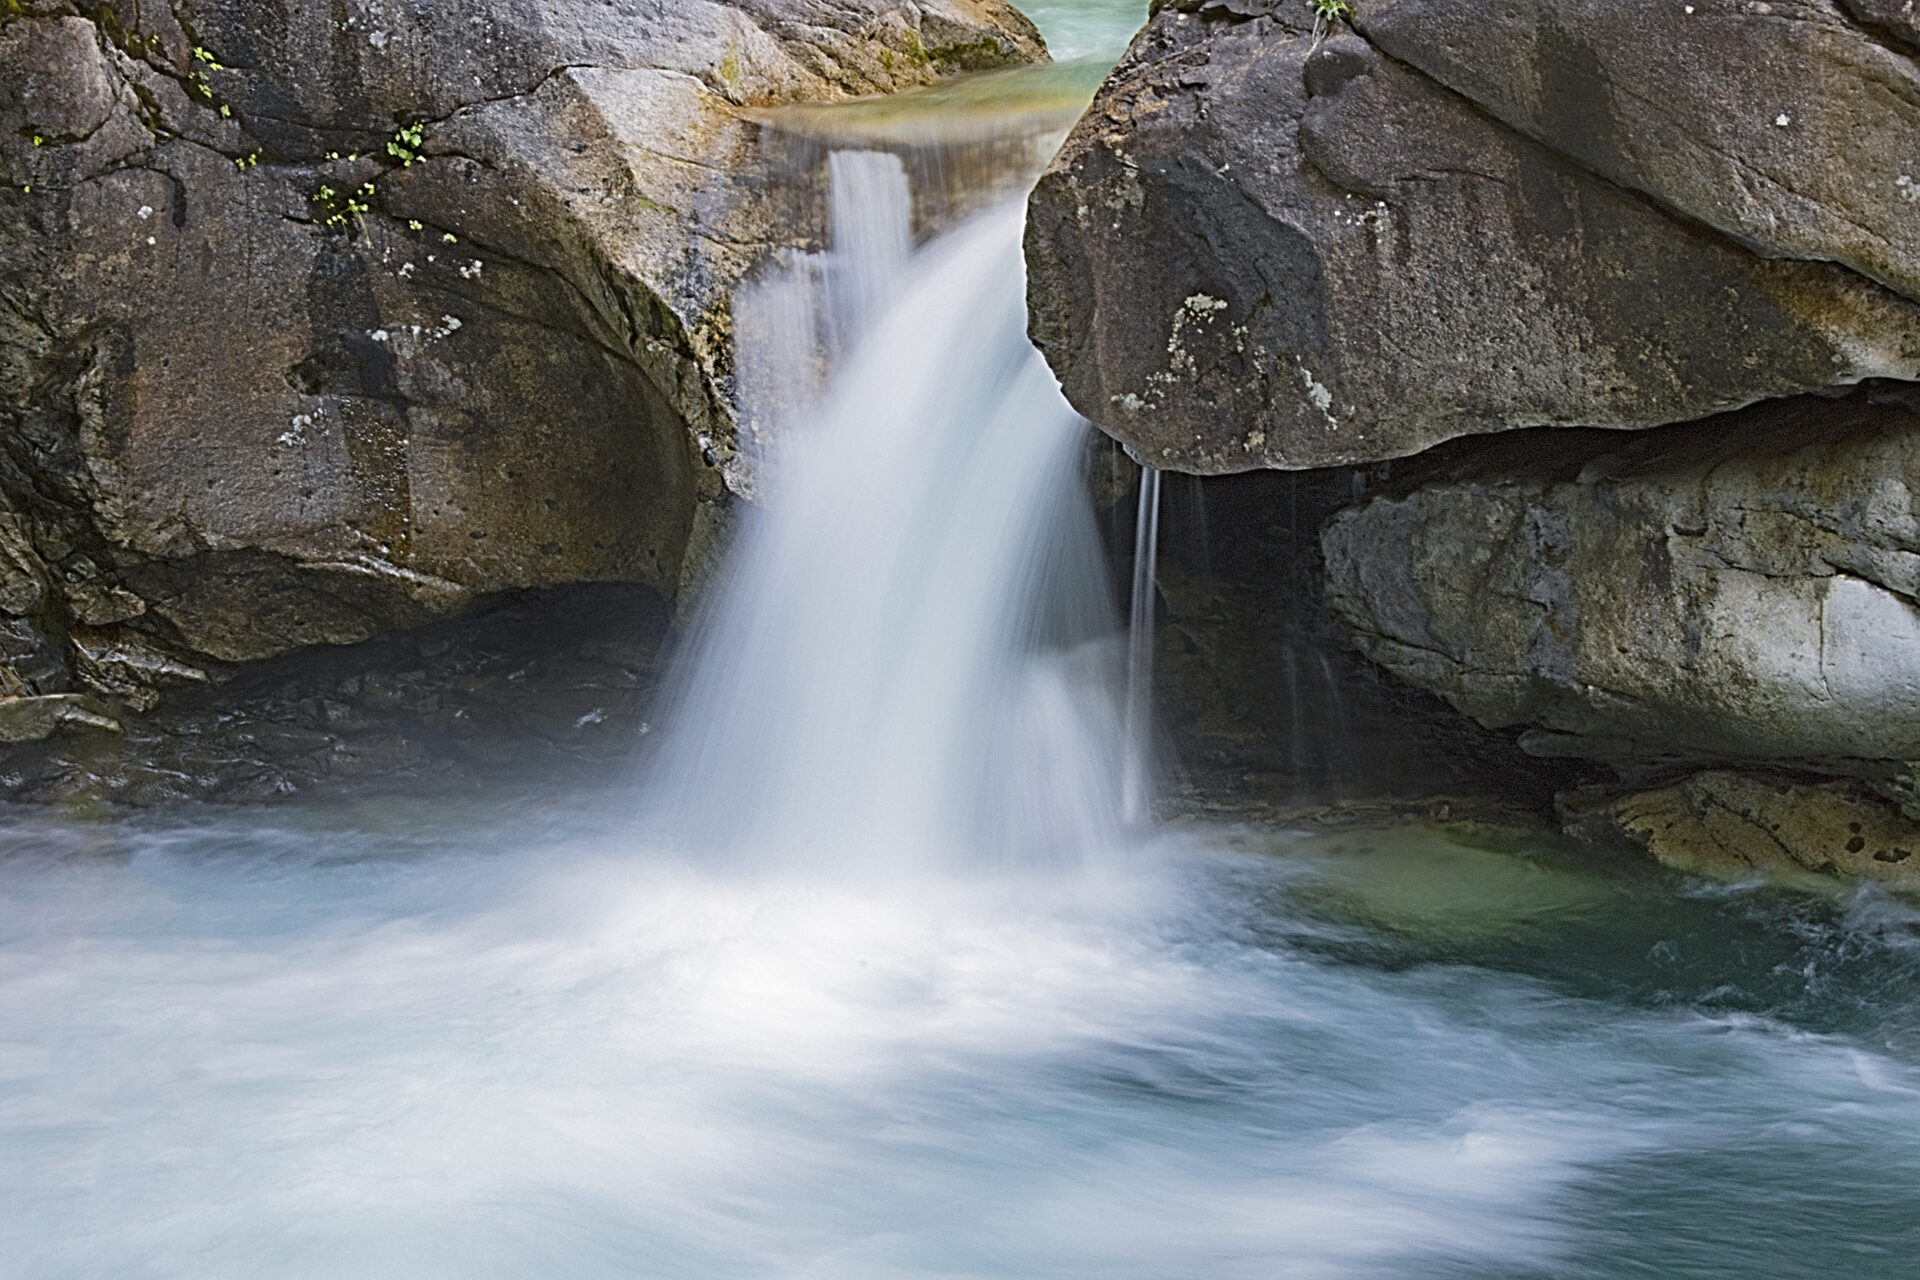 Waterfall in Skwellepil Creek/Chehalis Lake, July 10, 2021